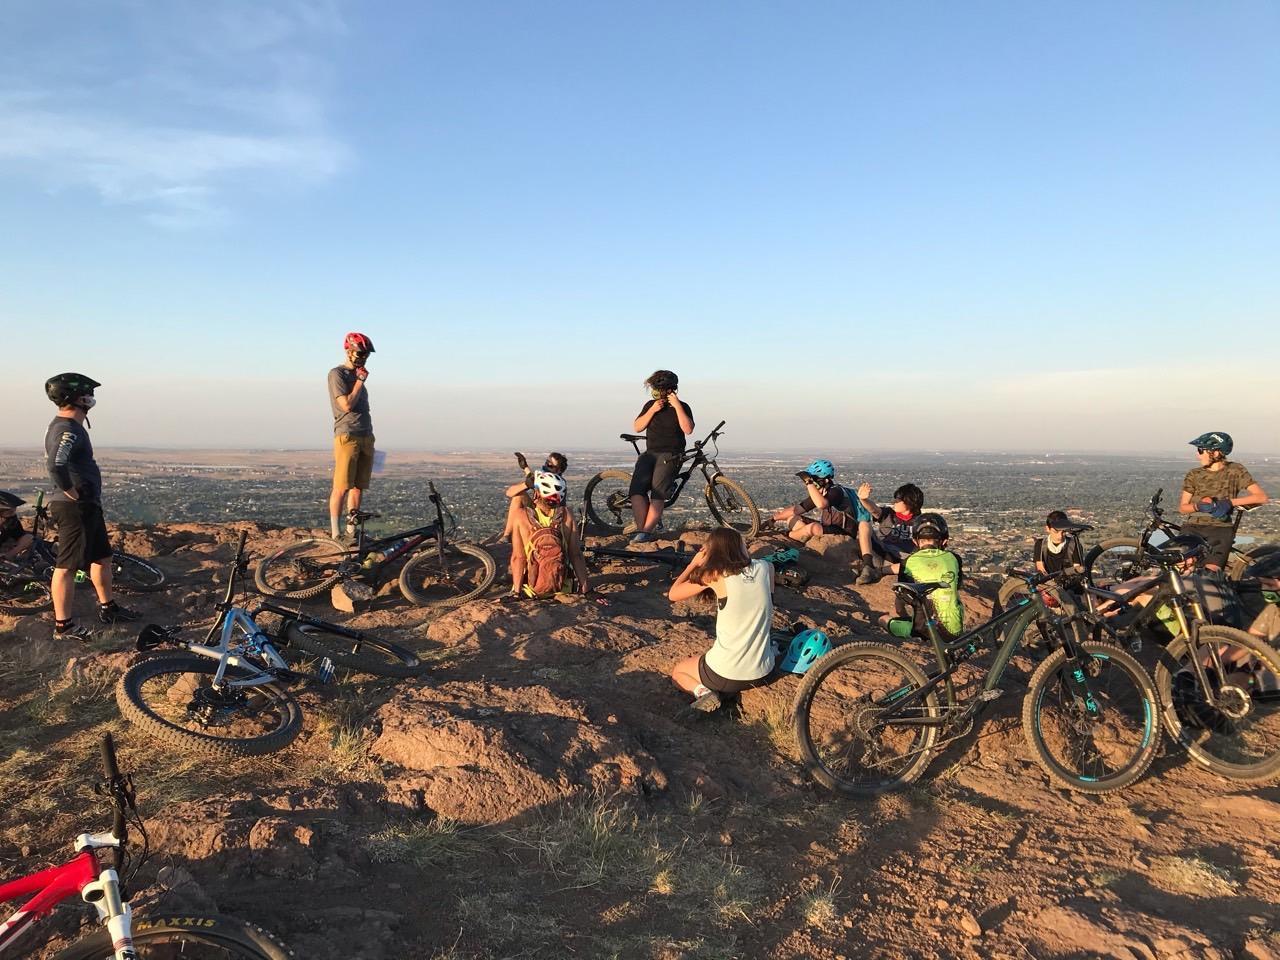 Mountain Bike Team on trails